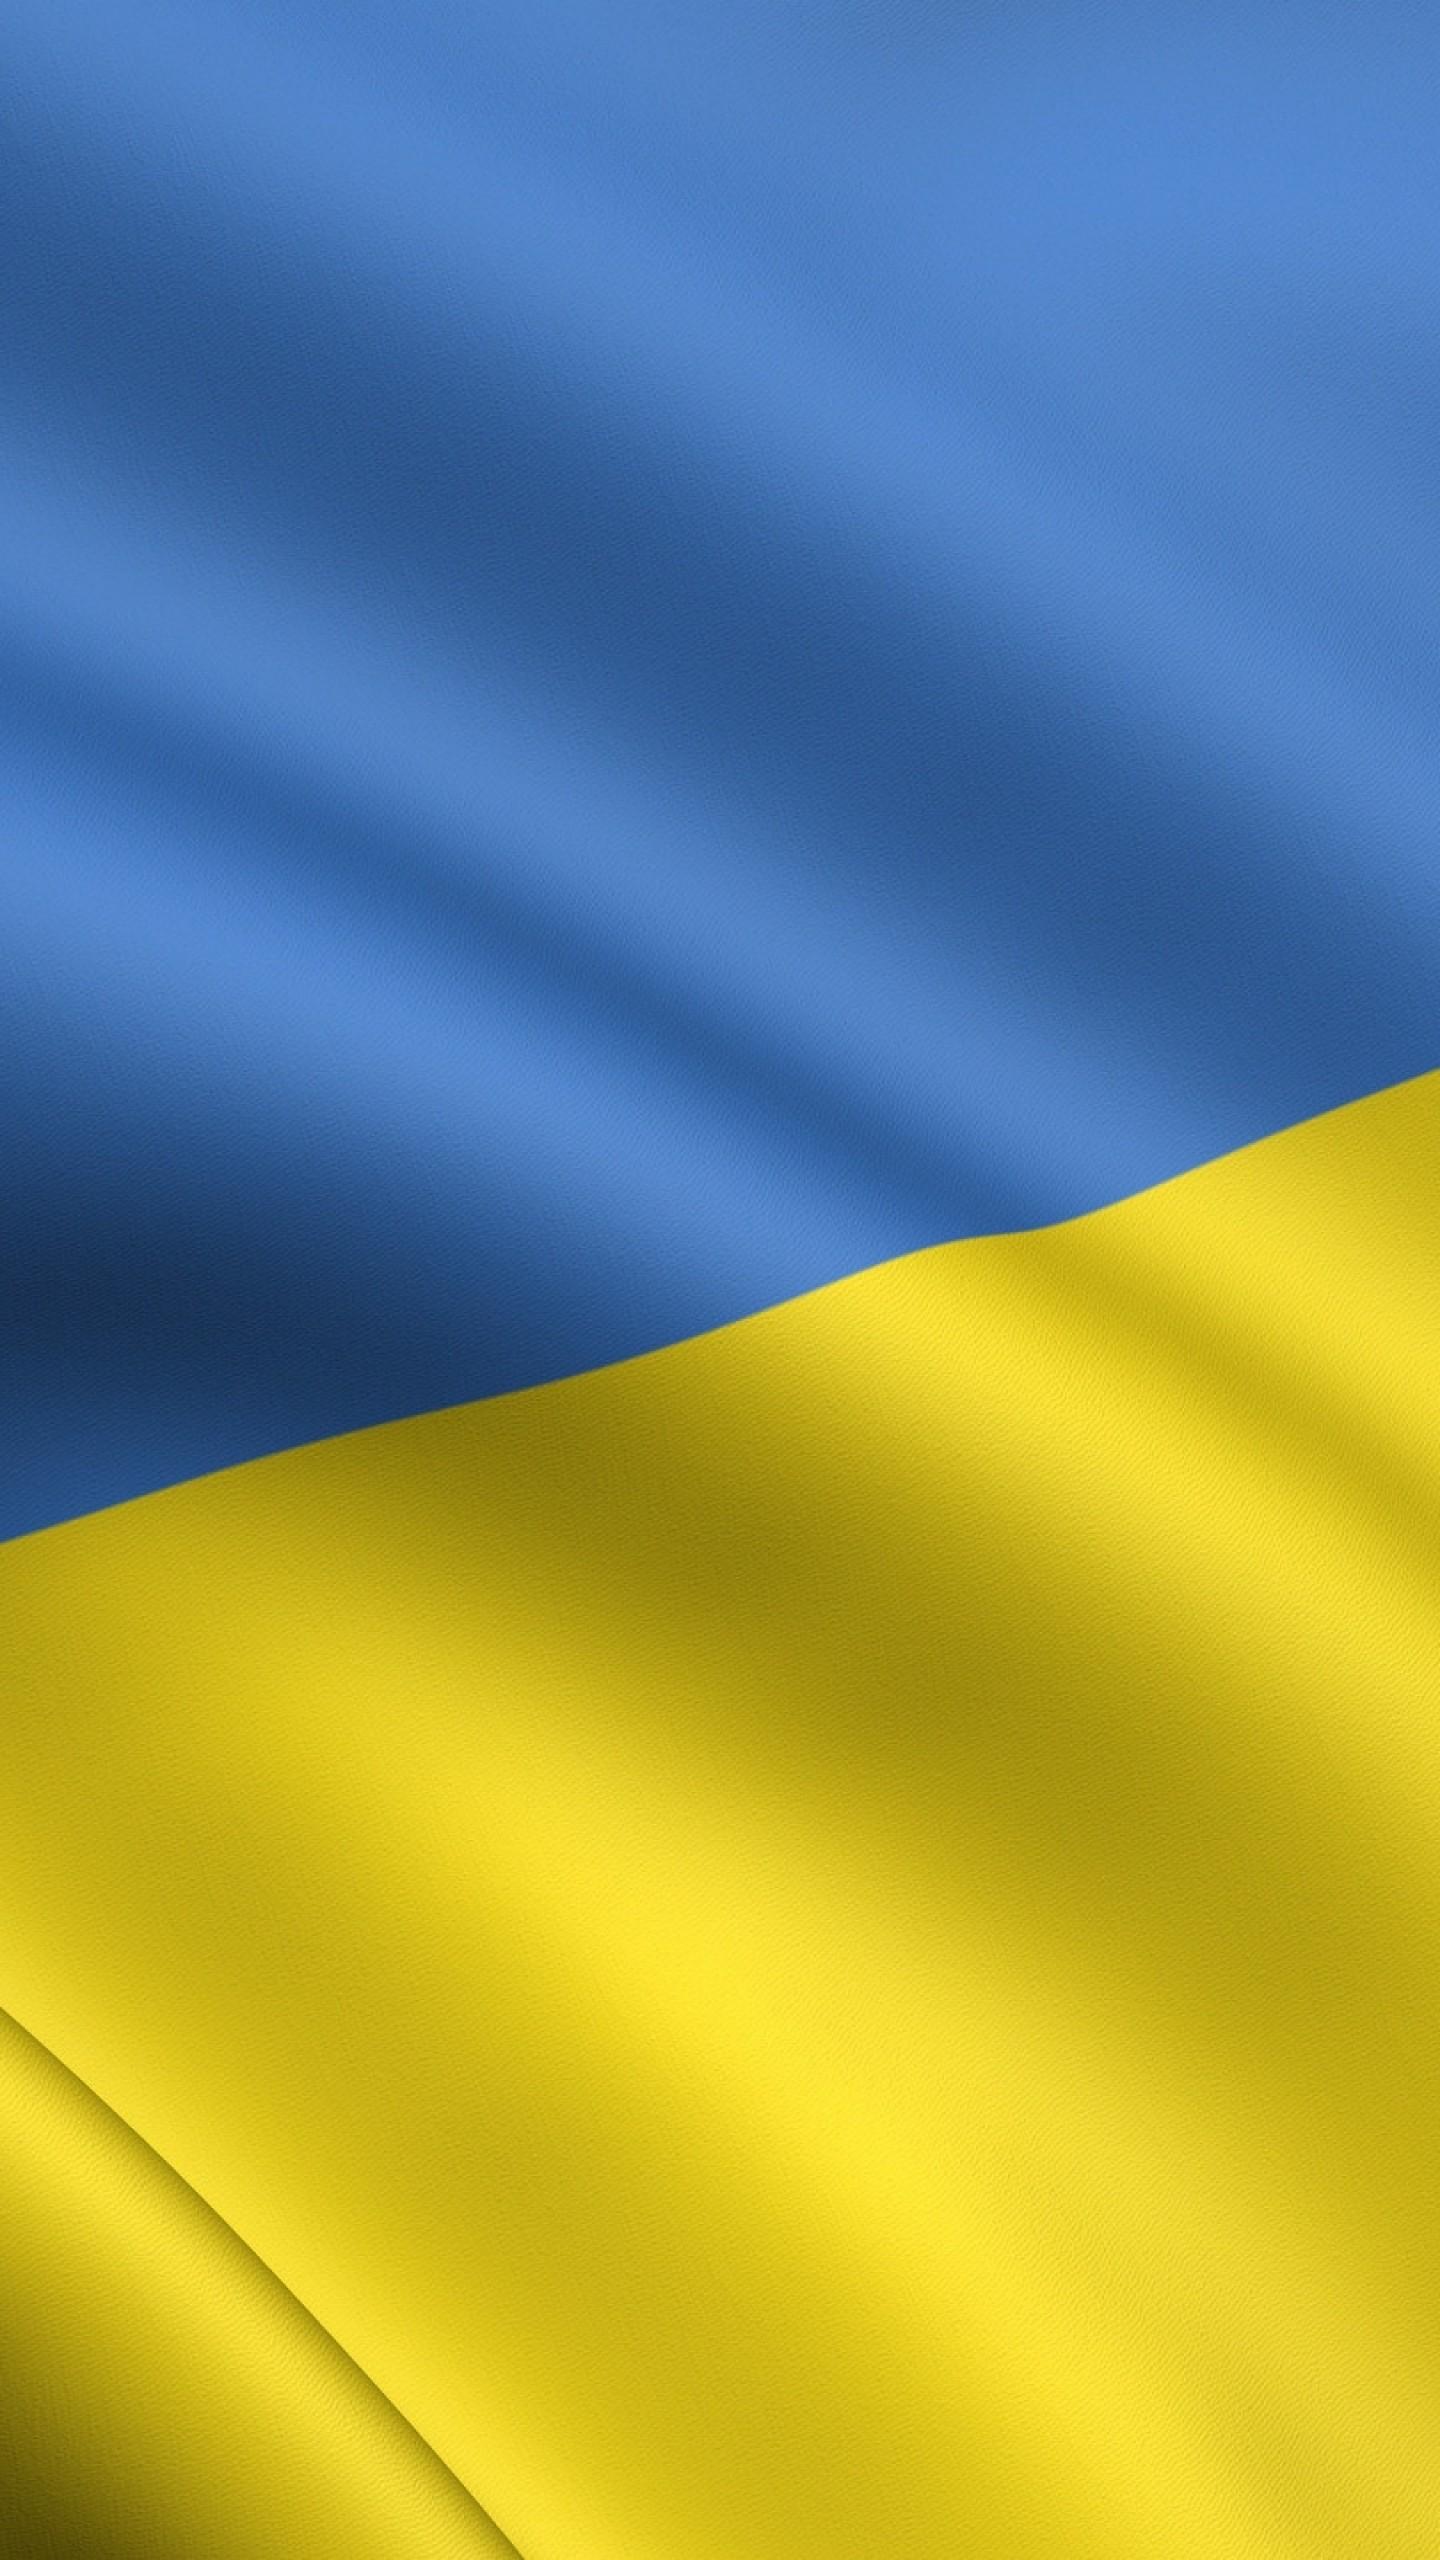 Preview wallpaper yellow, blue, flag, ukraine 1440×2560